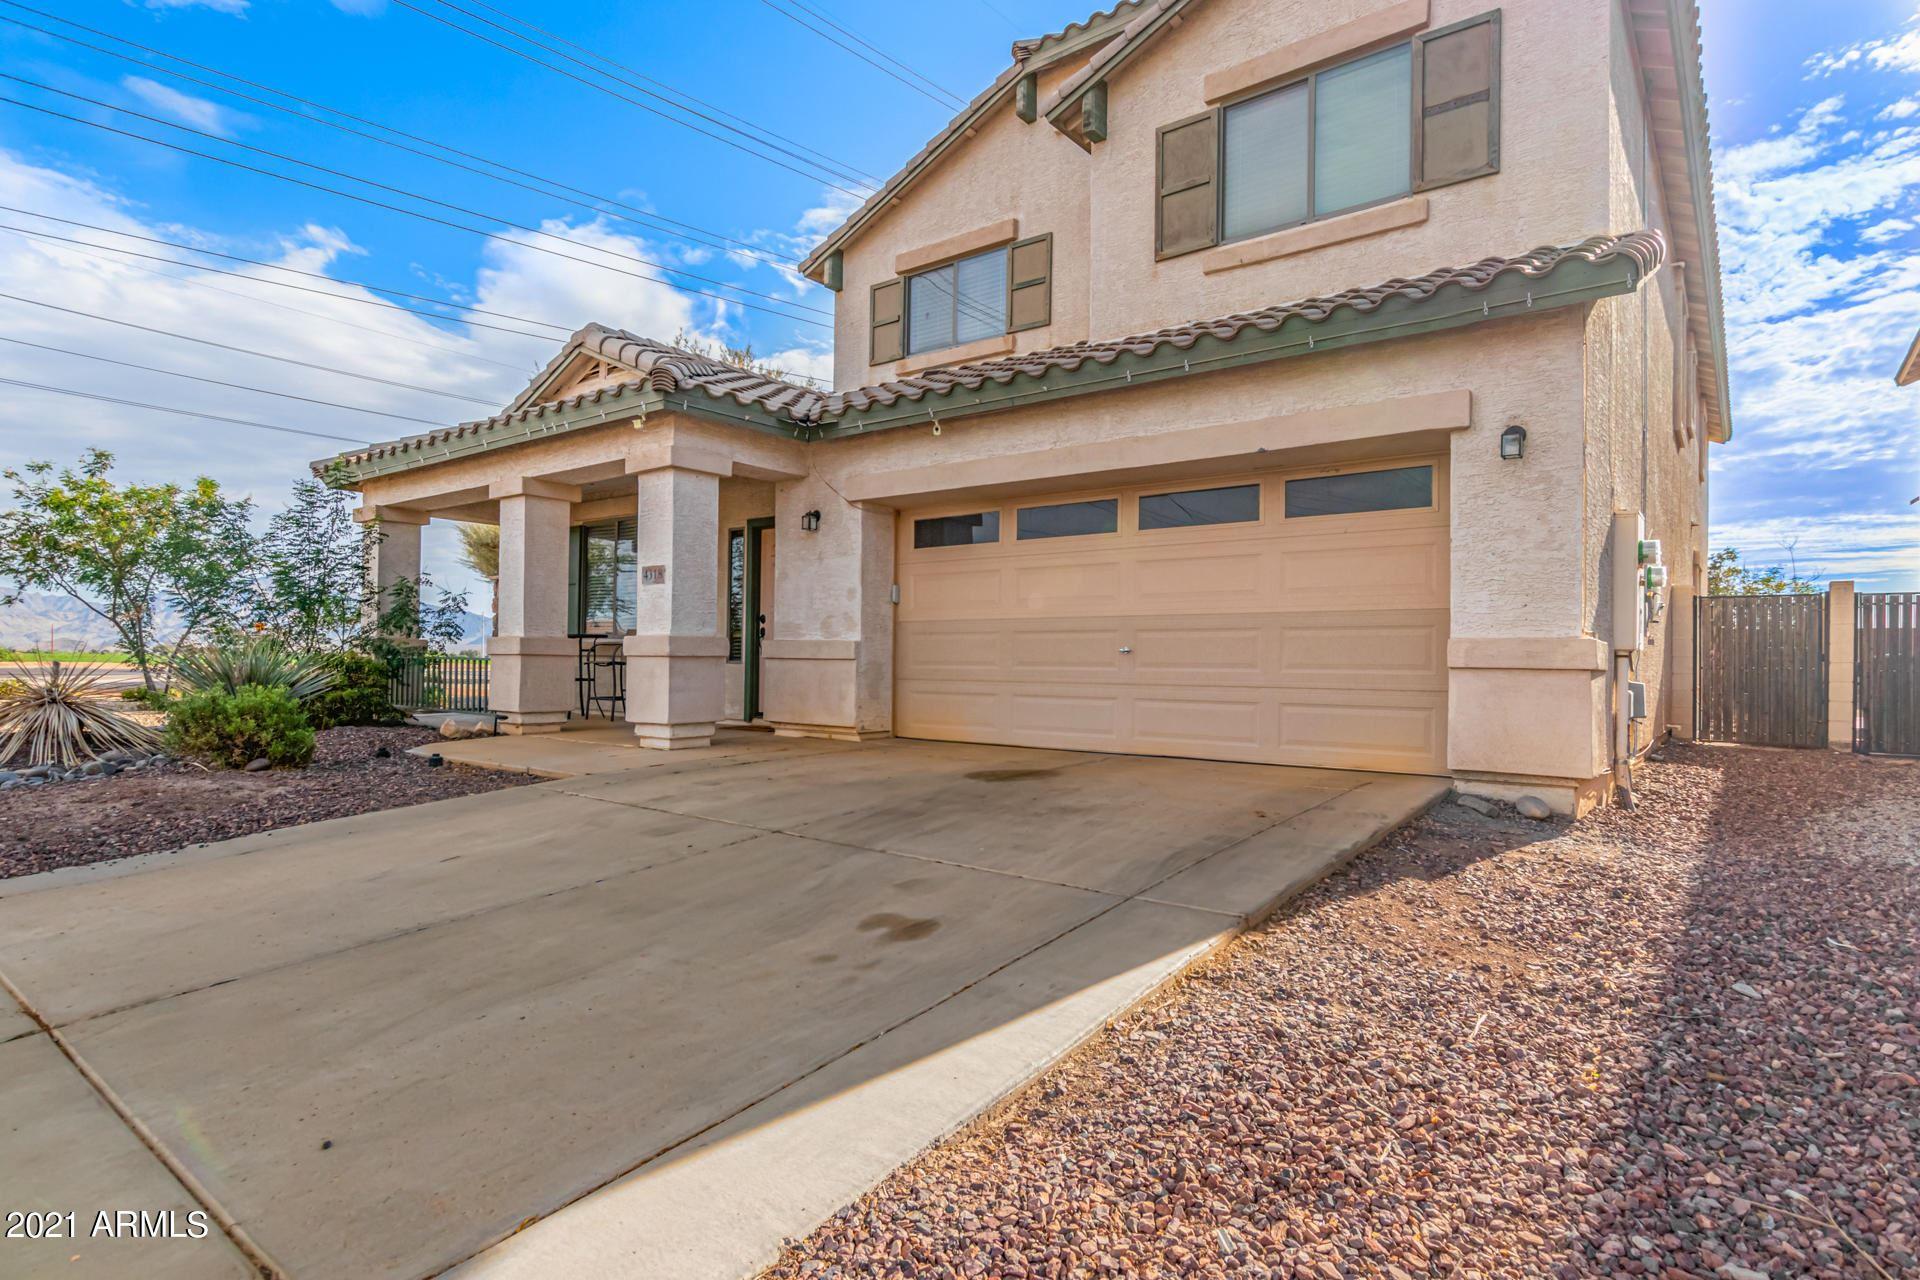 Photo of 4318 S 104TH Lane, Tolleson, AZ 85353 (MLS # 6262140)